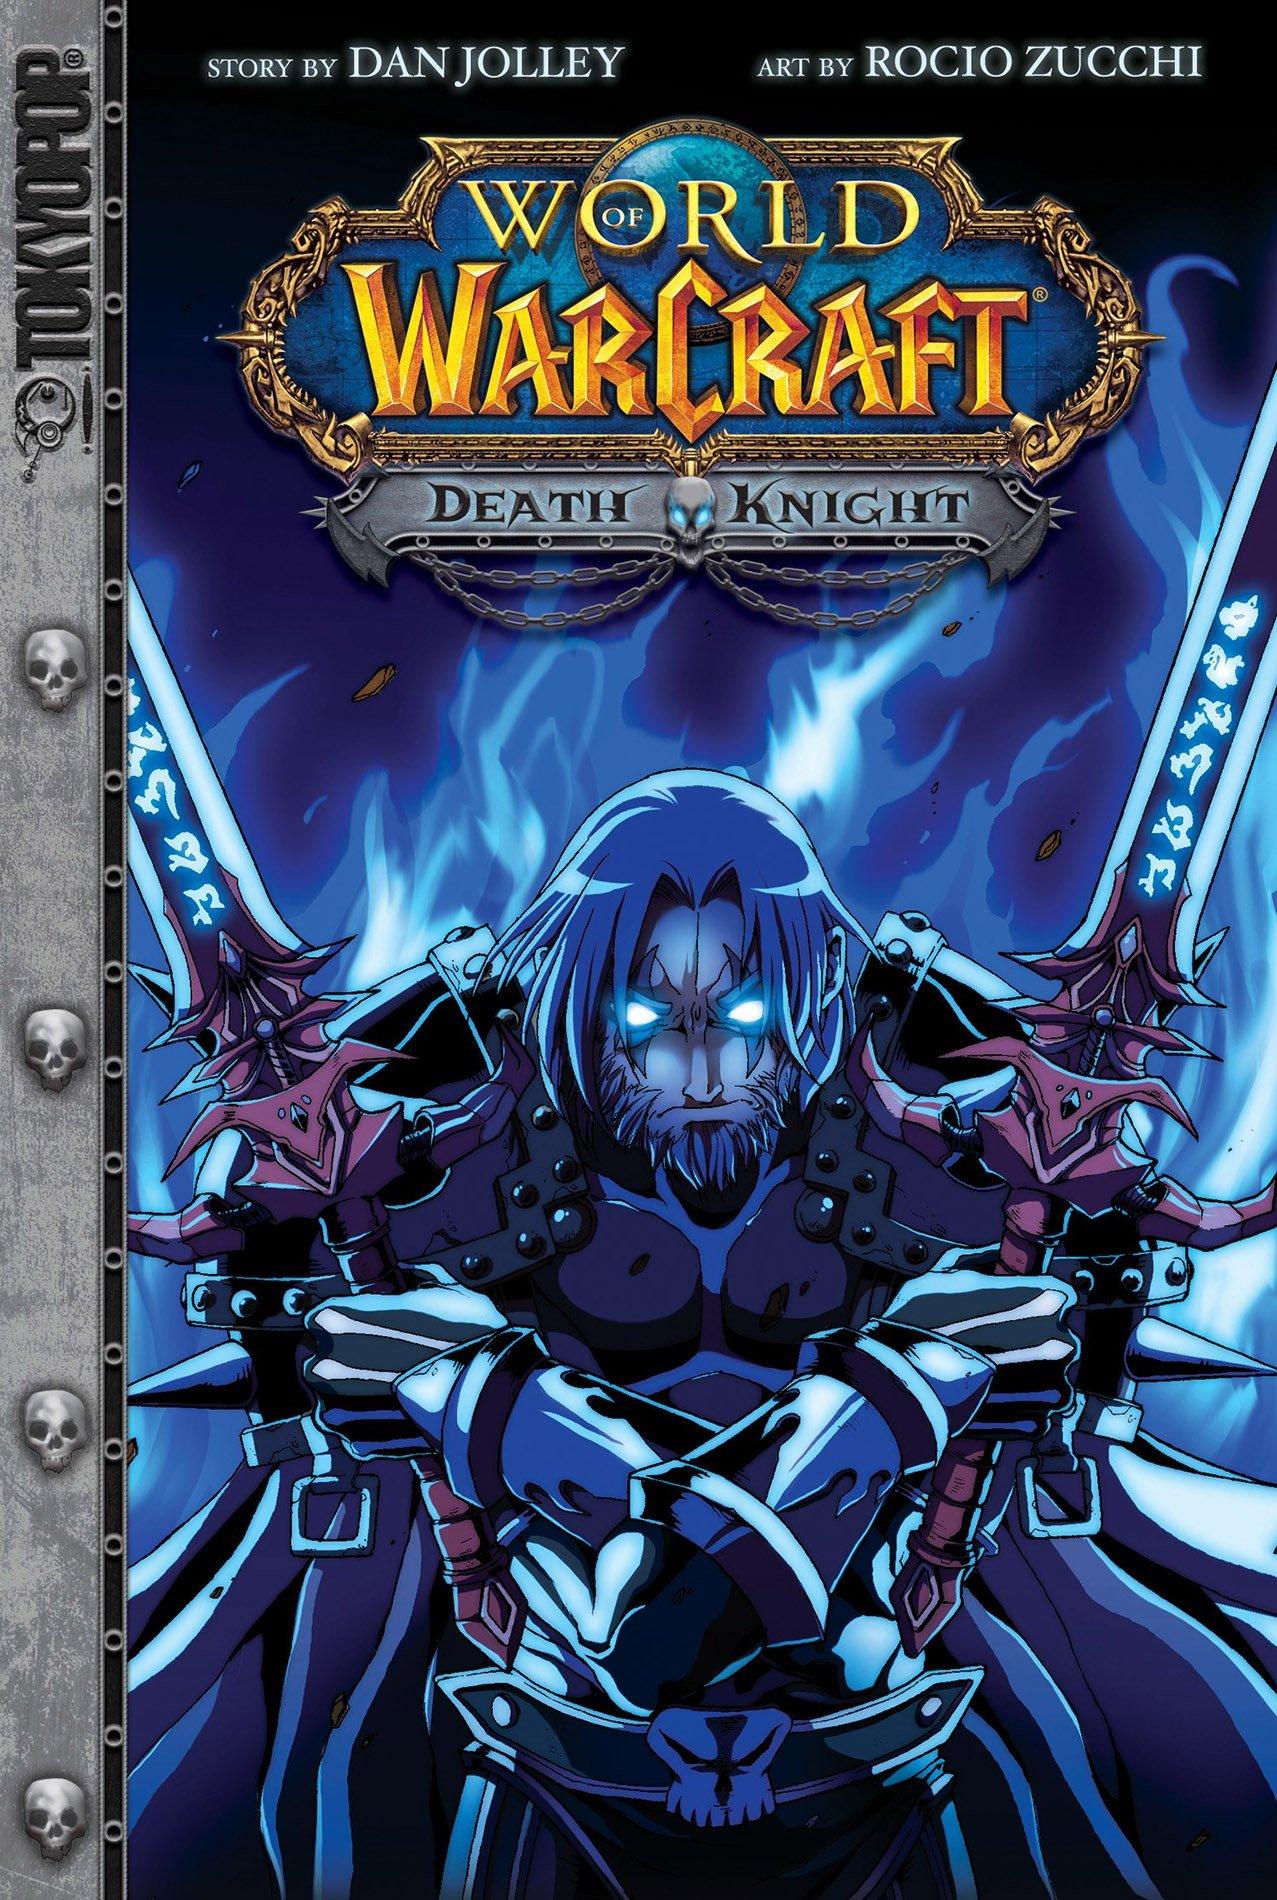 World of Warcraft - Death Knight (2009)